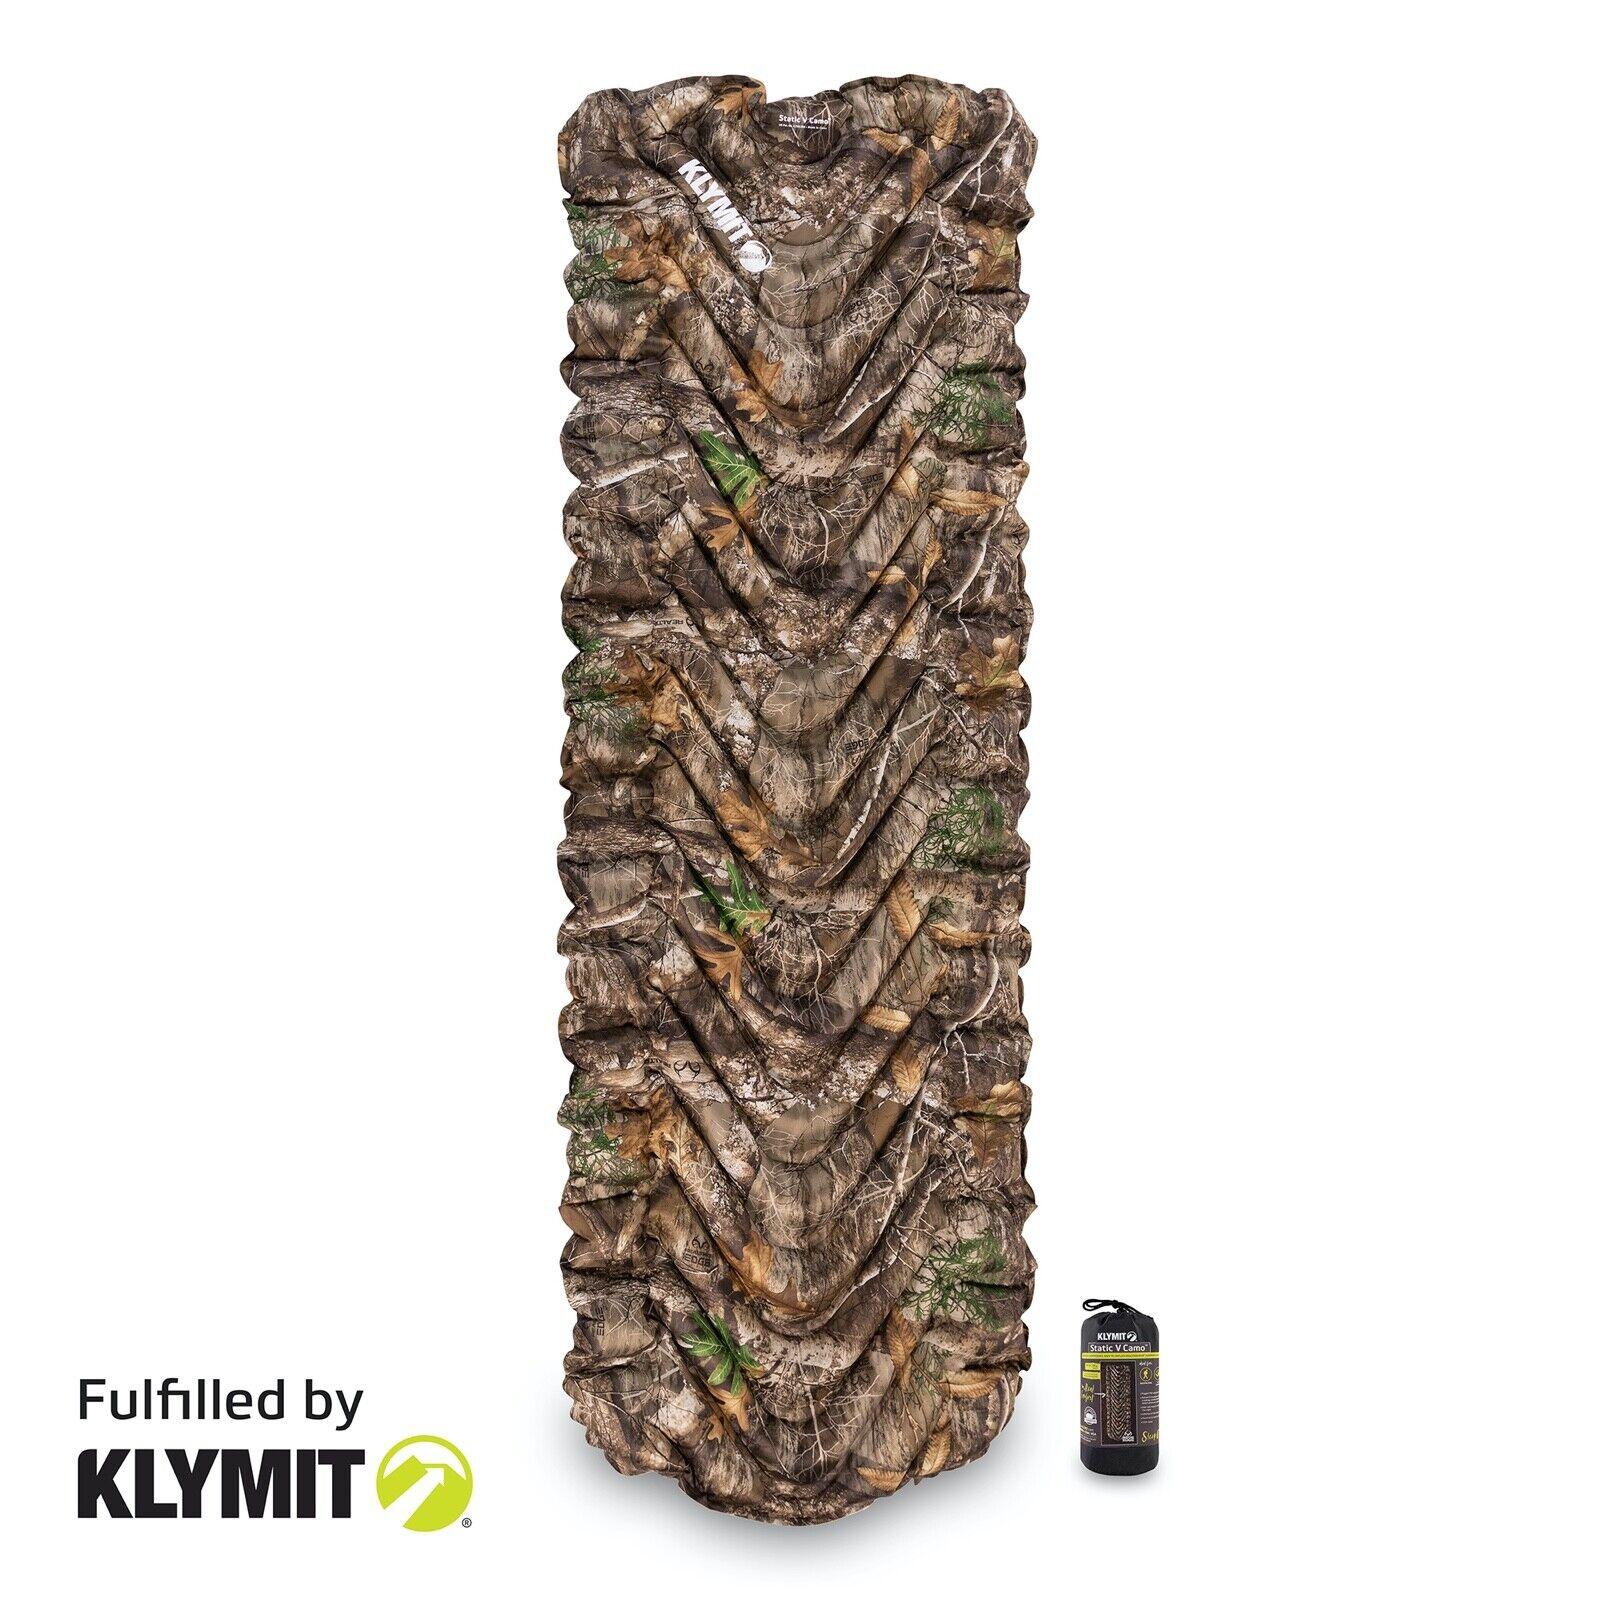 Klymit Static V RealTree Edge Sleeping Camping Pad - Certified Refurbished